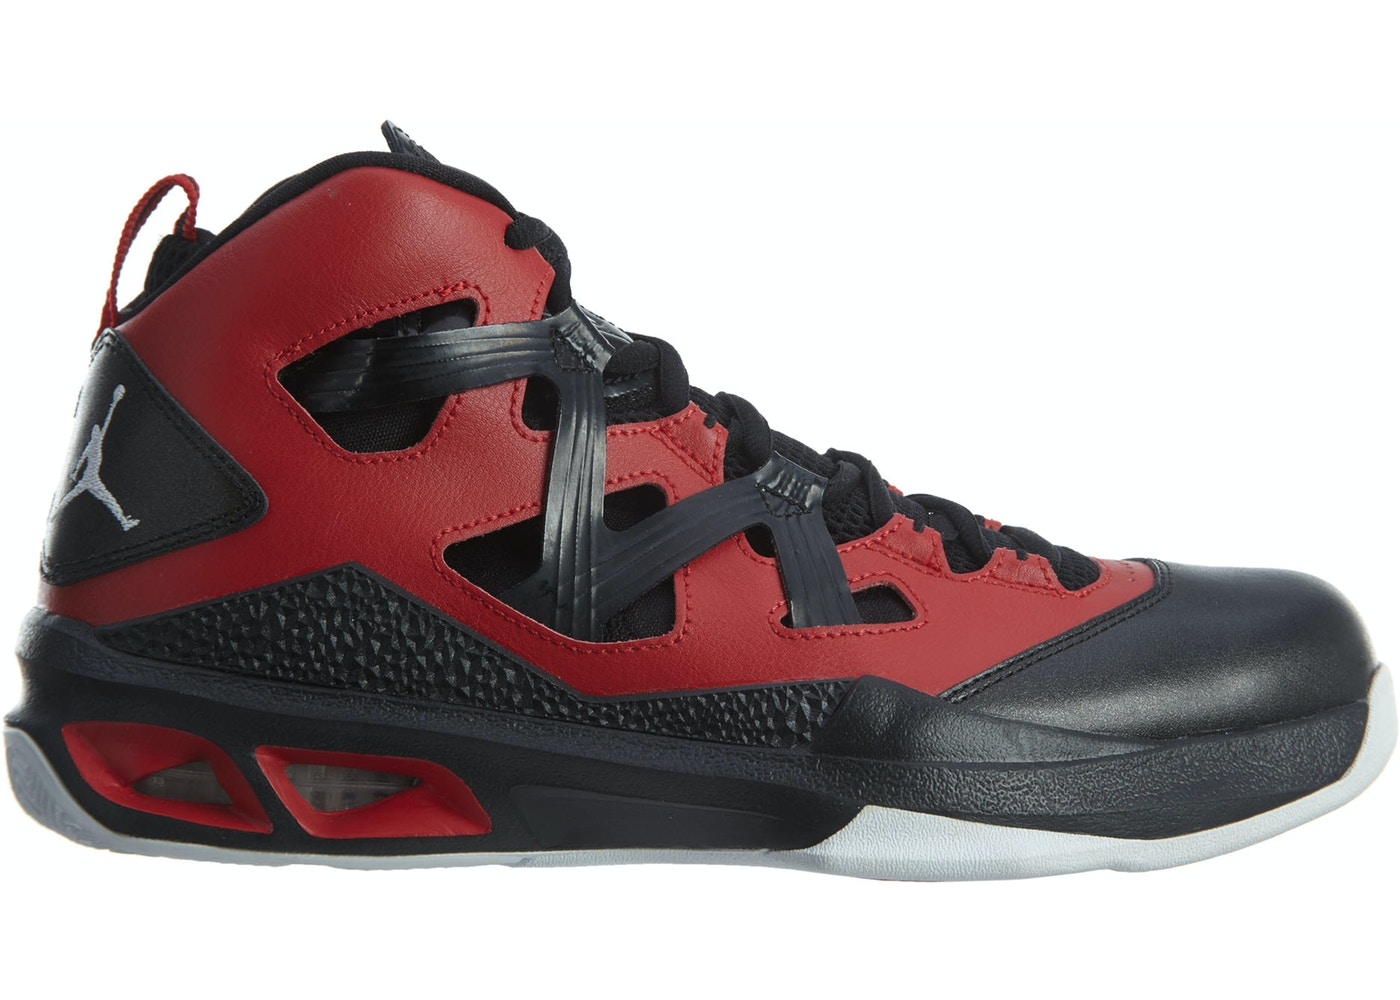 93754f0c2099e1 Jordan Melo M9 Gym Red White-Black - 551879-601